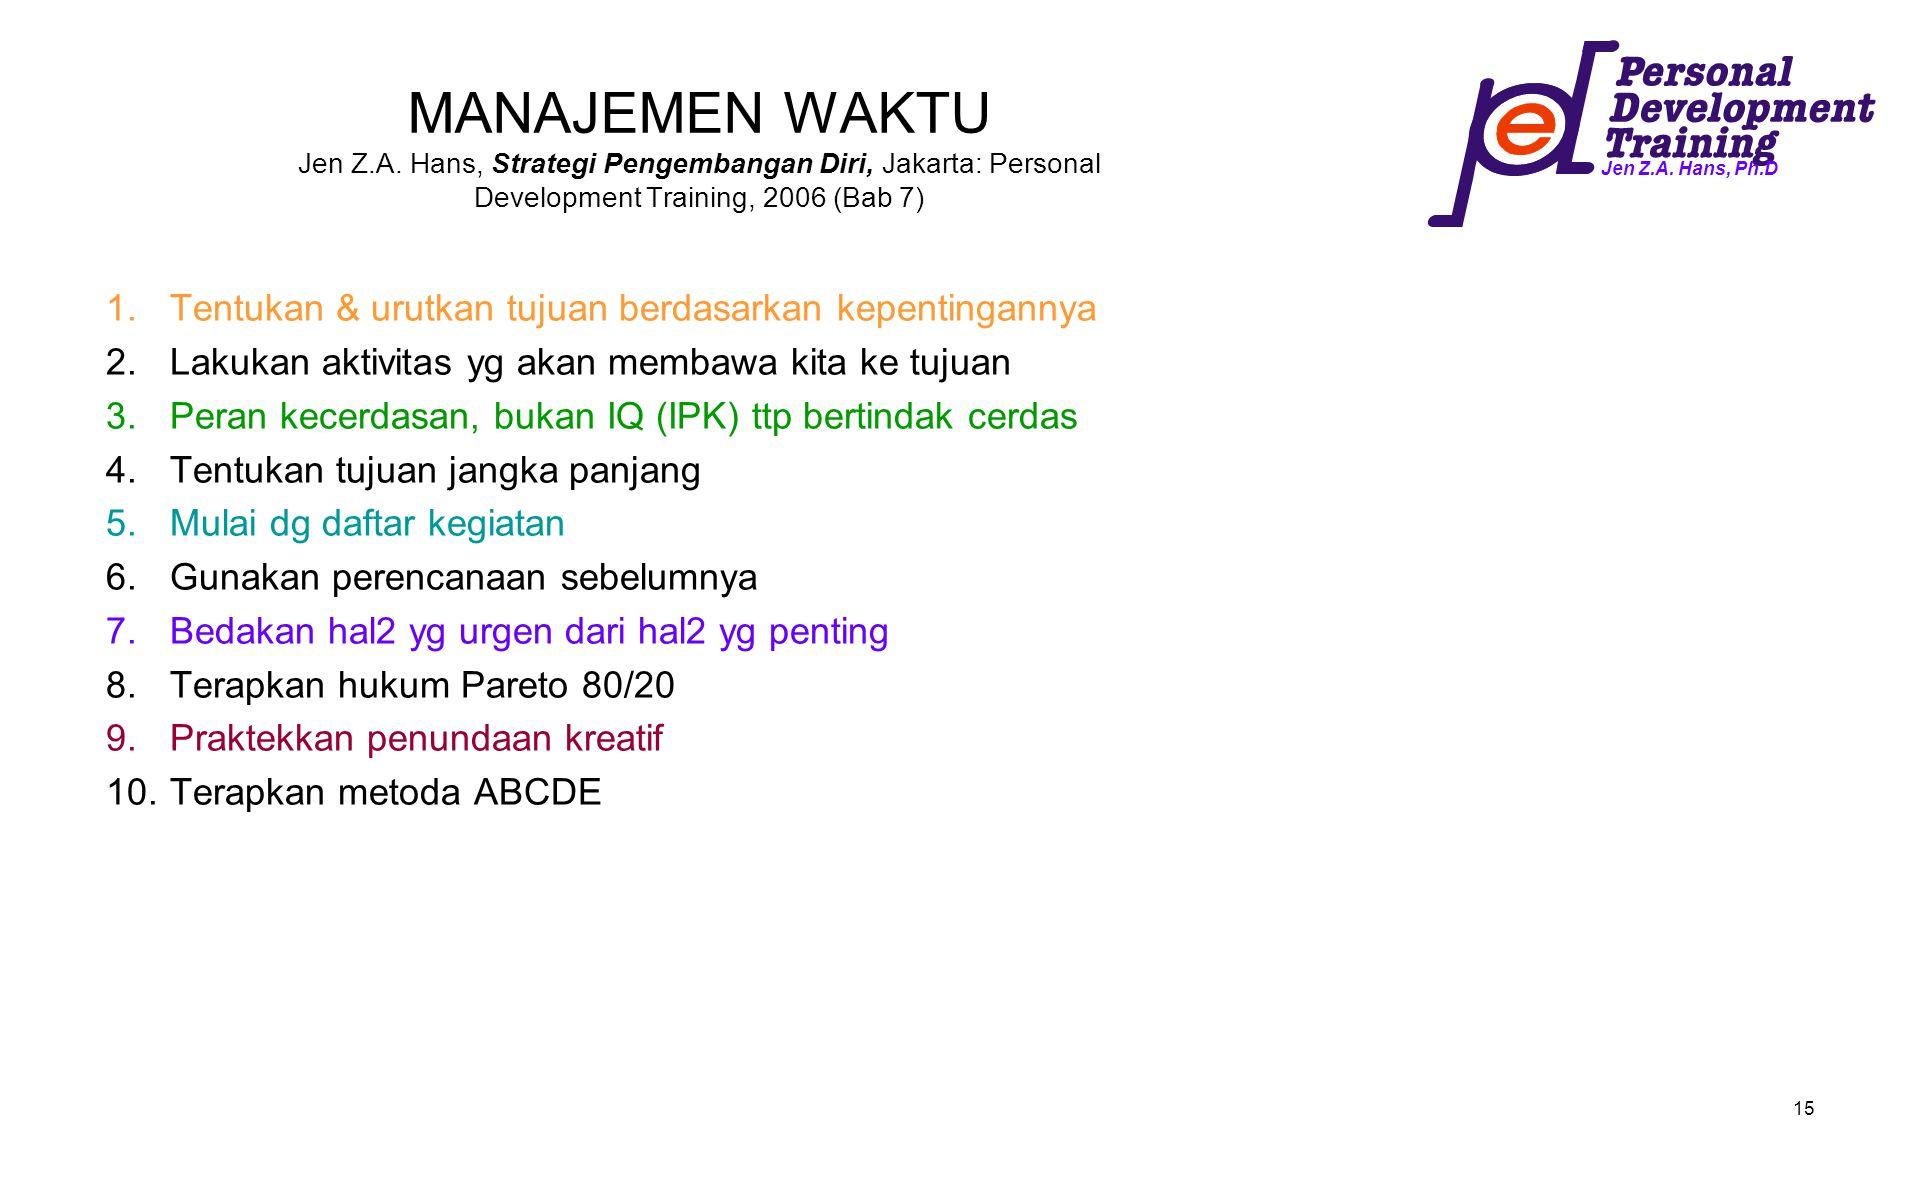 MANAJEMEN WAKTU Jen Z.A. Hans, Strategi Pengembangan Diri, Jakarta: Personal Development Training, 2006 (Bab 7)